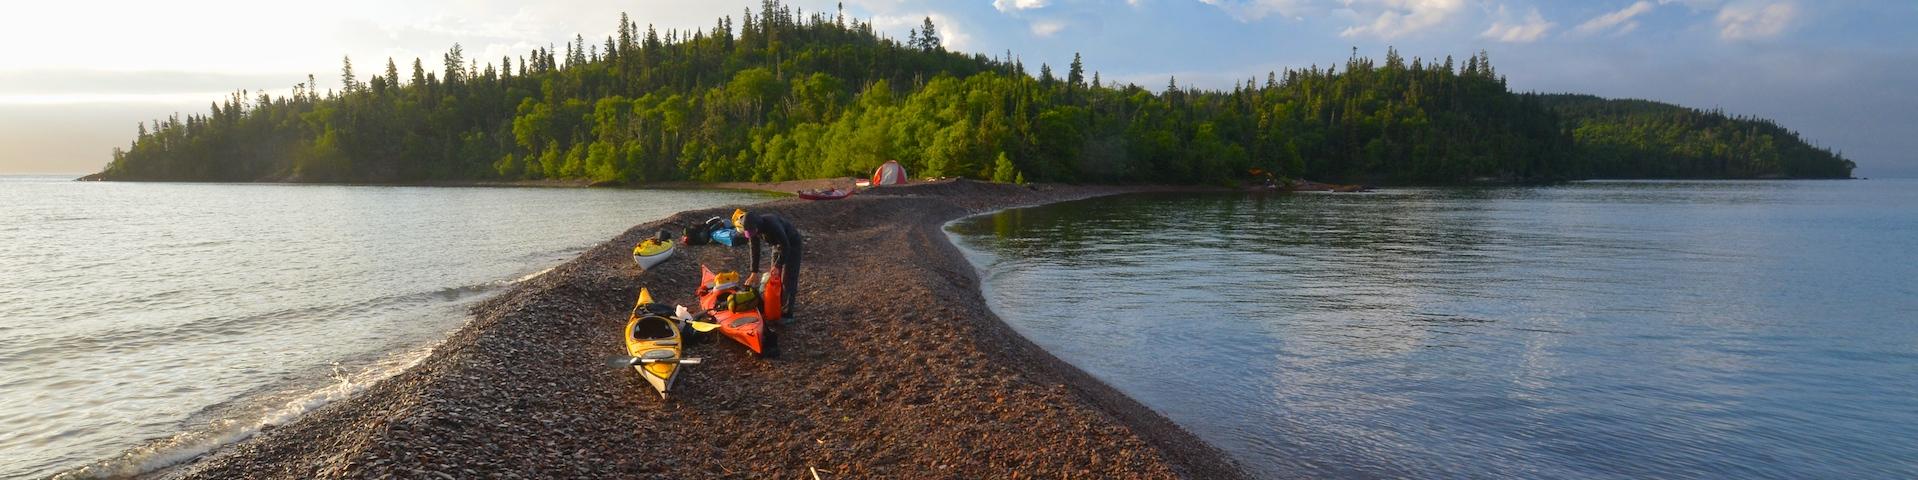 Lake Superior - Sea Kayak the Sibley Penisula by Naturally Superior Adventures - Image 234